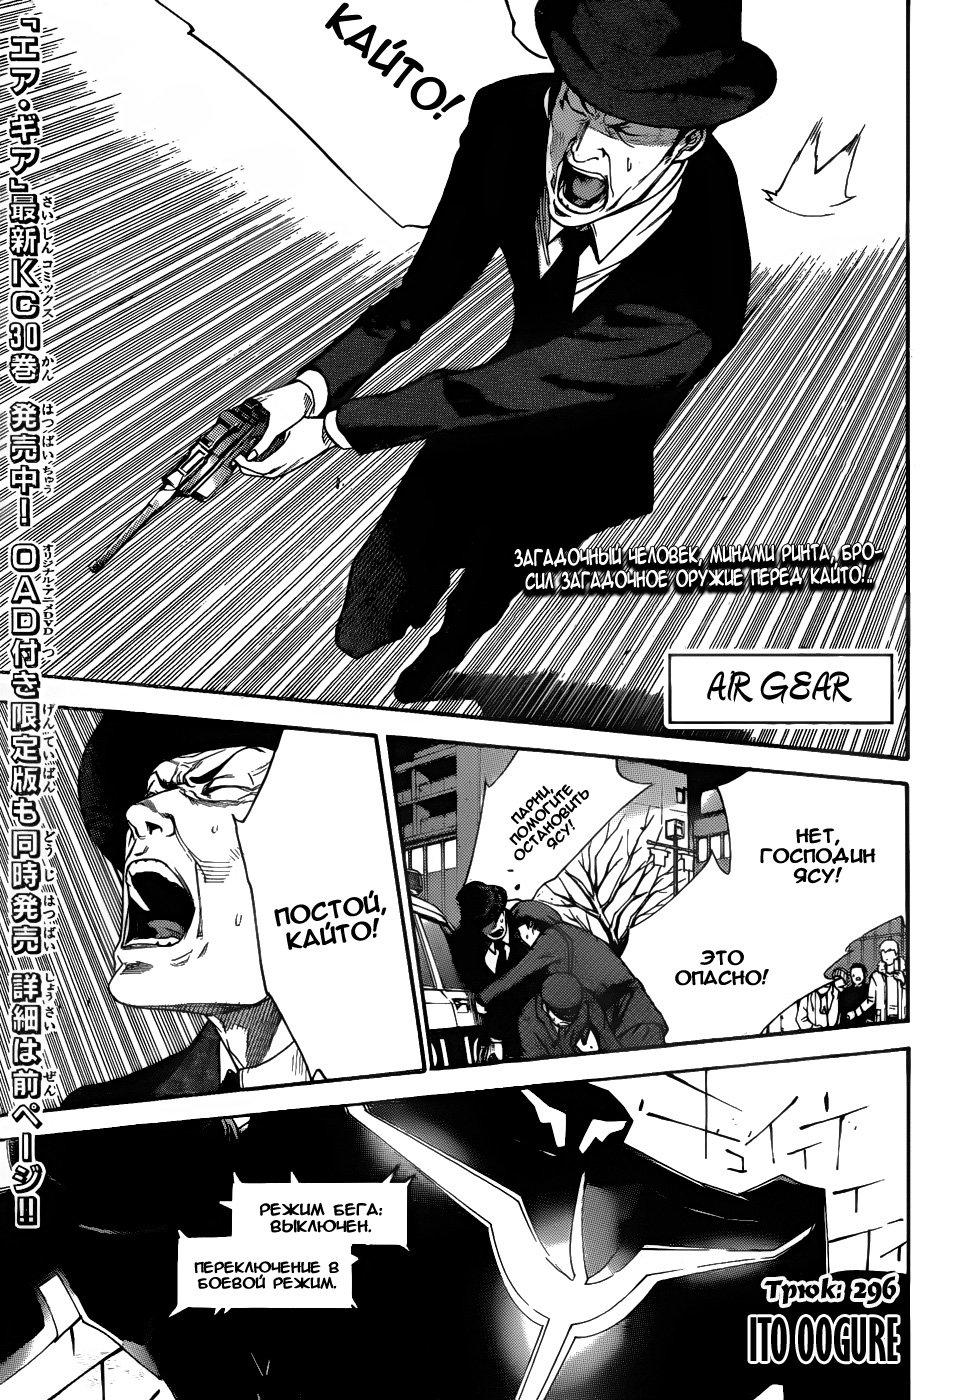 Манга Эйр Гир / Air Gear  - Том 31 Глава 296 Страница 2